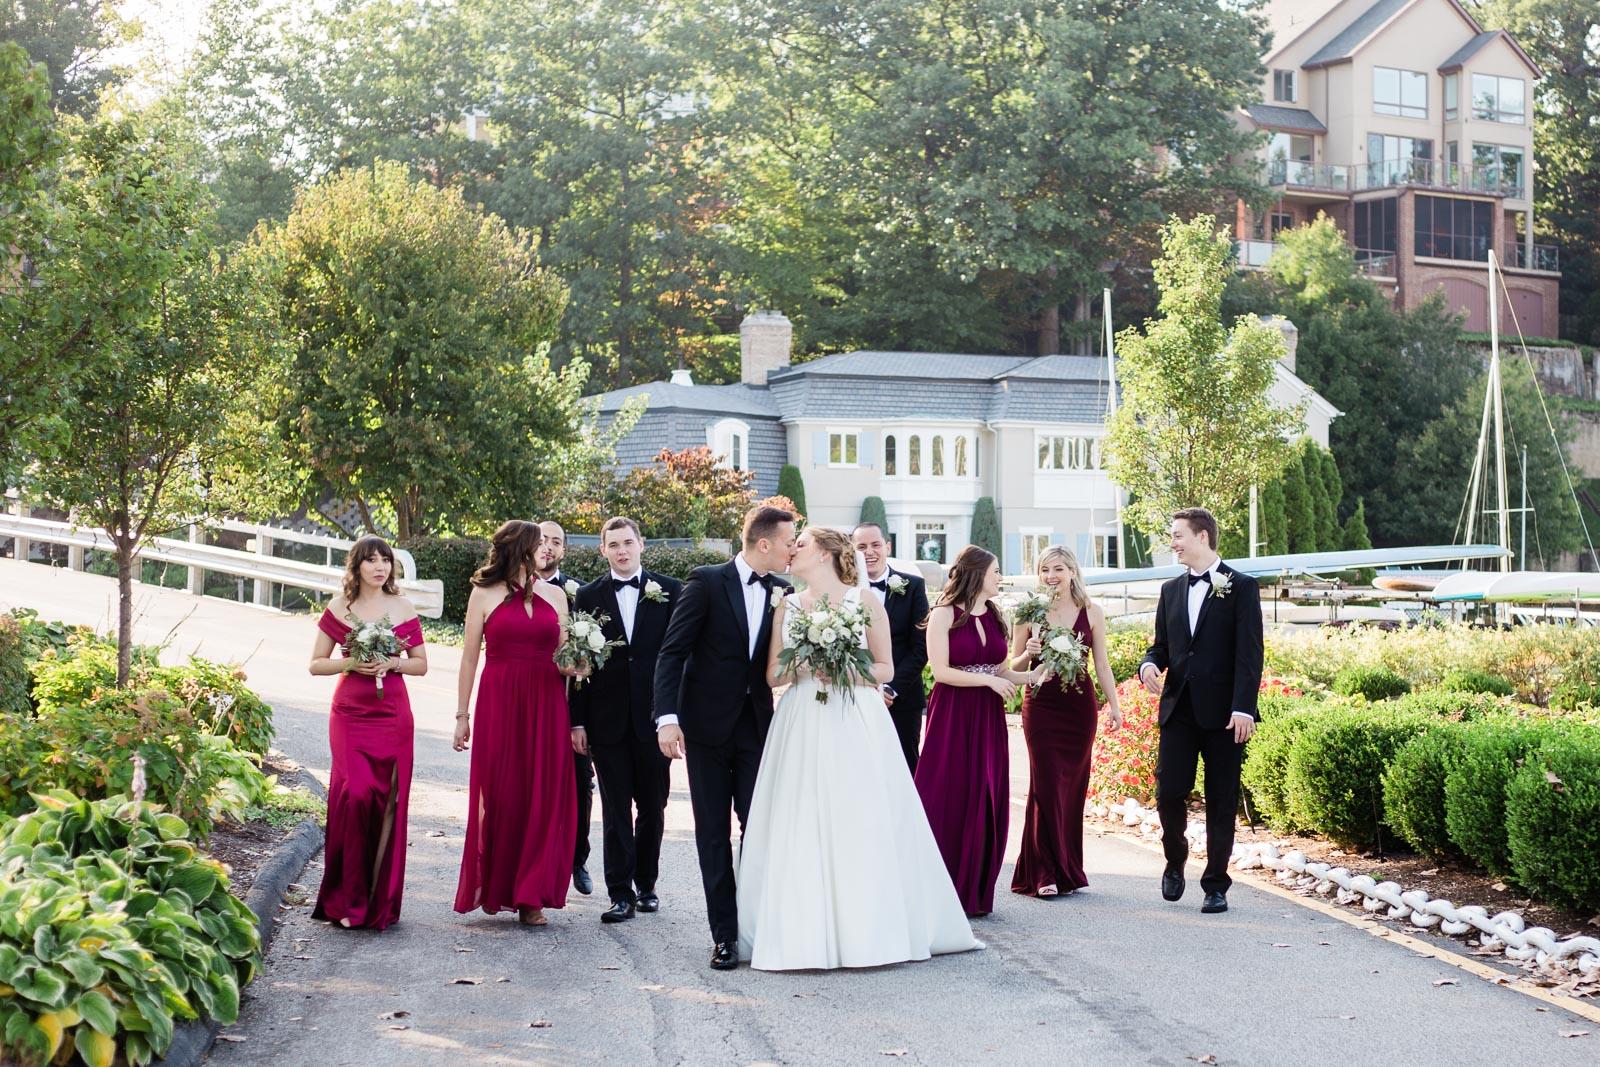 cleveland-yacht-club-wedding-photos-by-matt-erickson-photography-10.jpg